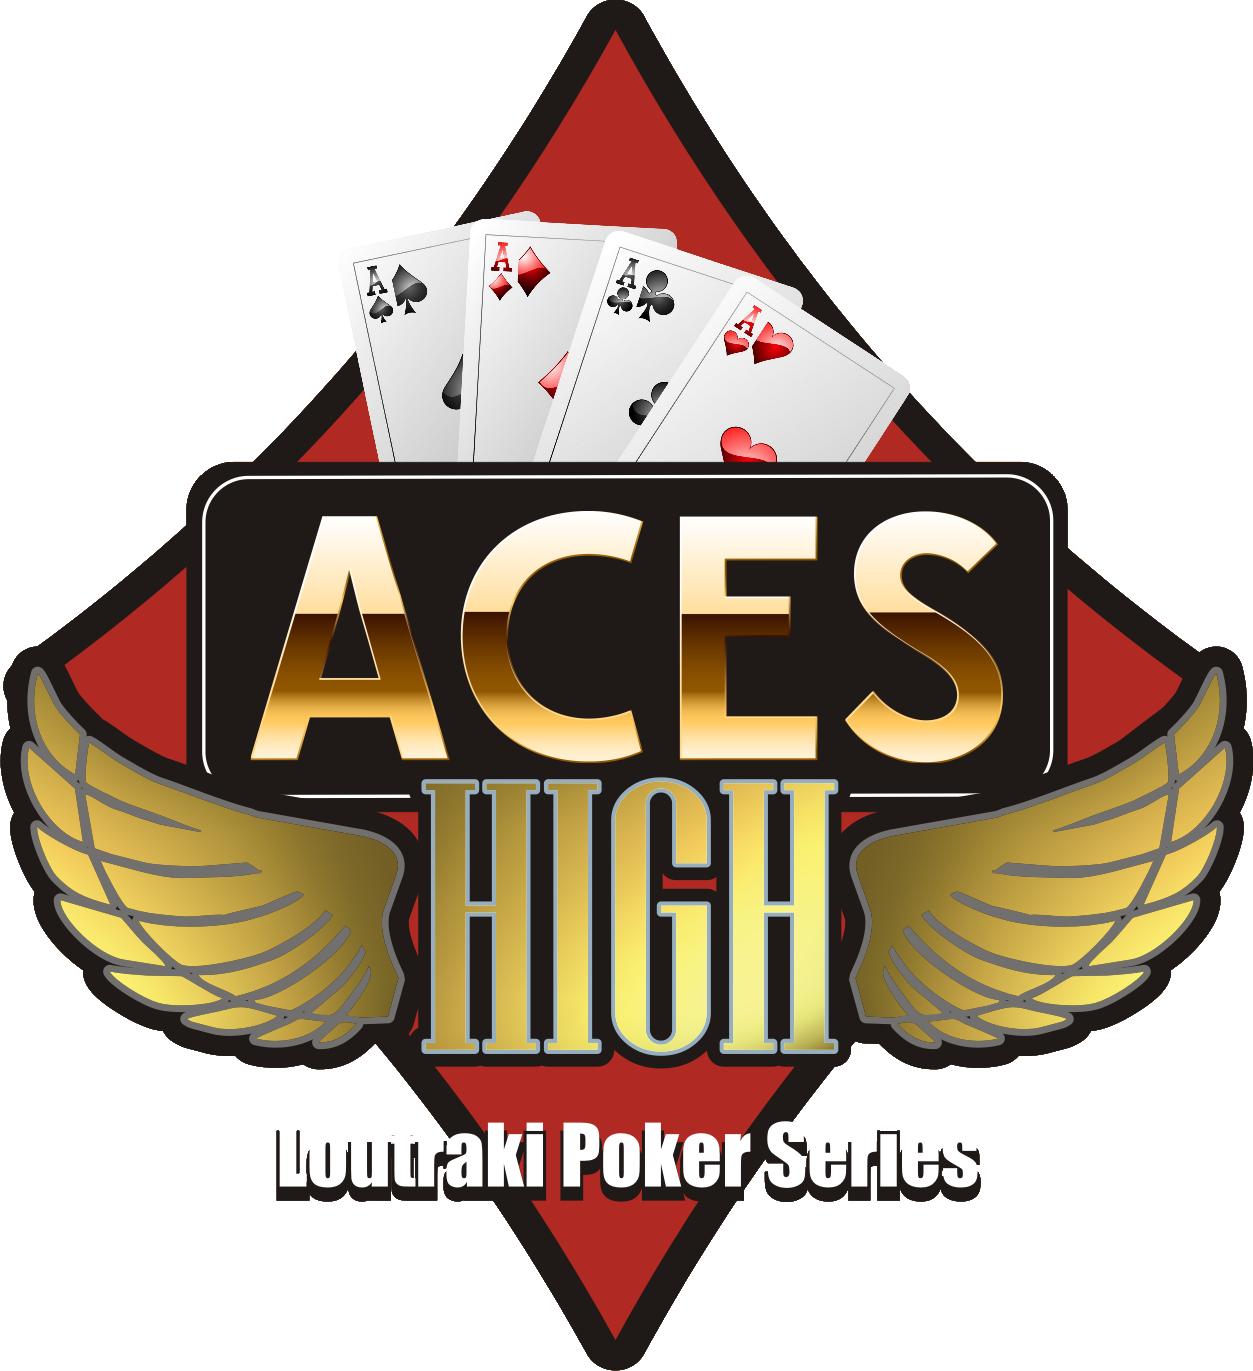 Casino loutraki tournament game. Tickets clipart poker